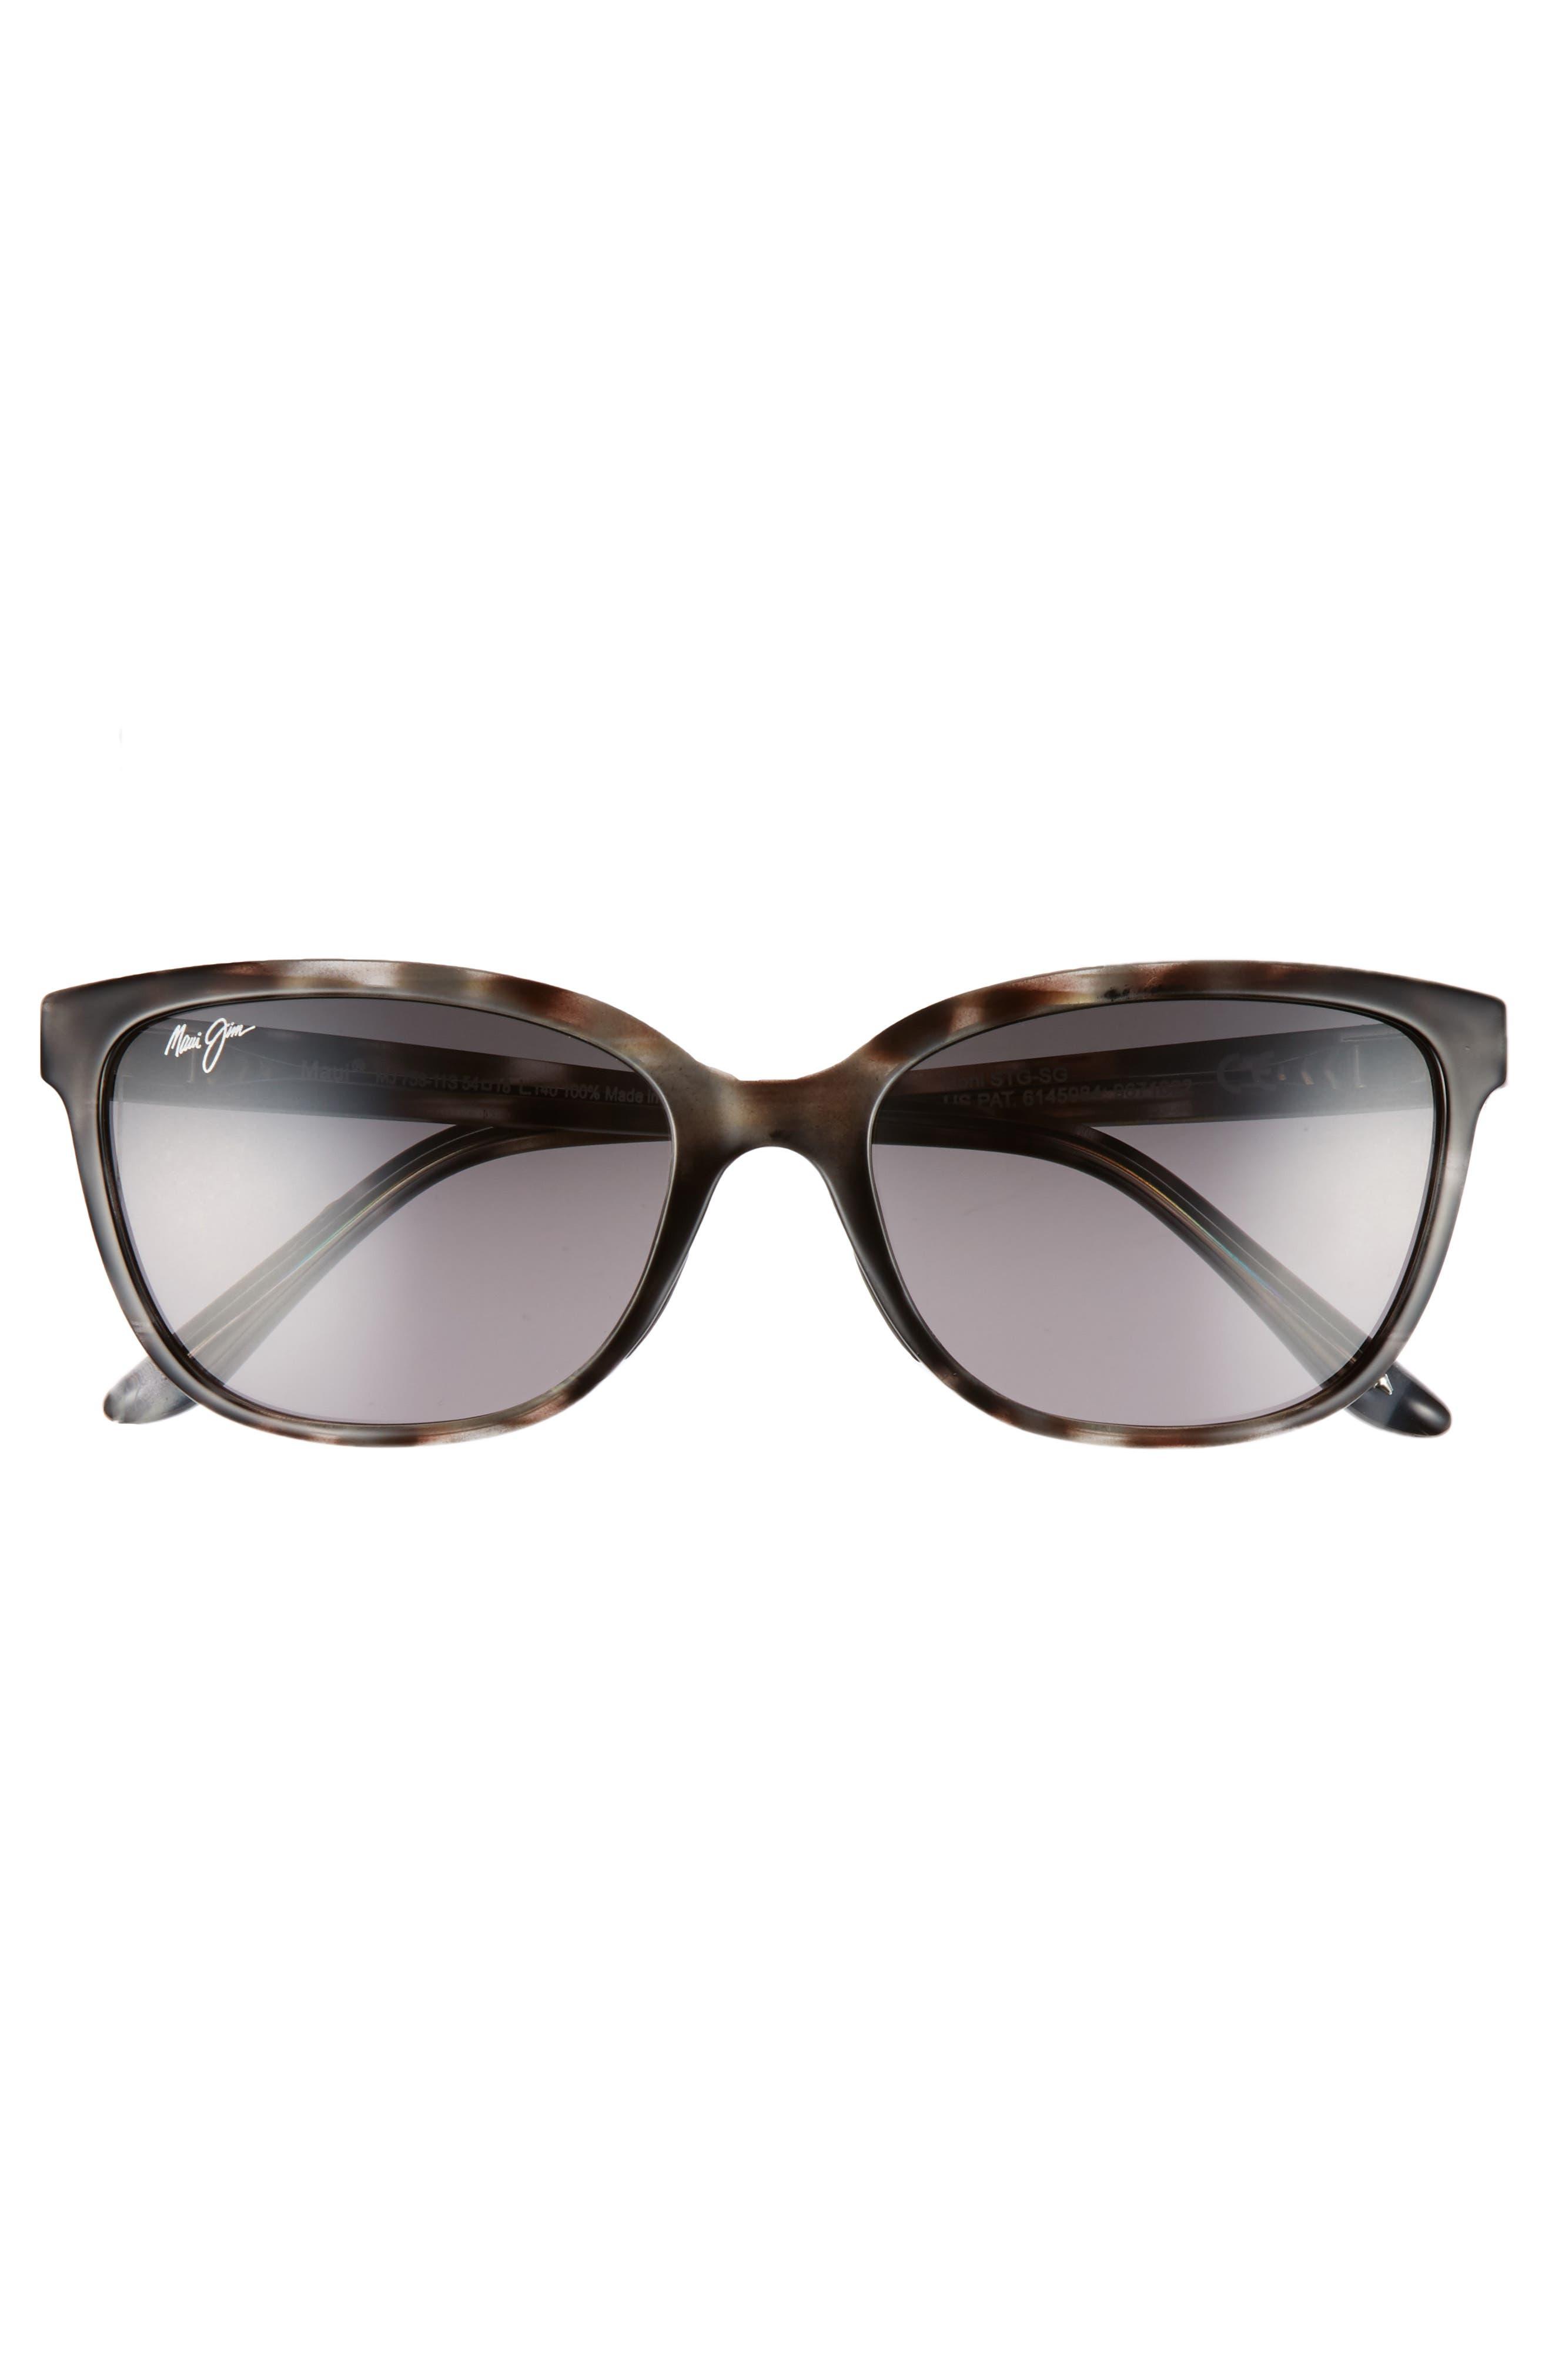 Honi 54mm Polarized Cat Eye Sunglasses,                             Alternate thumbnail 3, color,                             GREY TORTOISE STRIPE